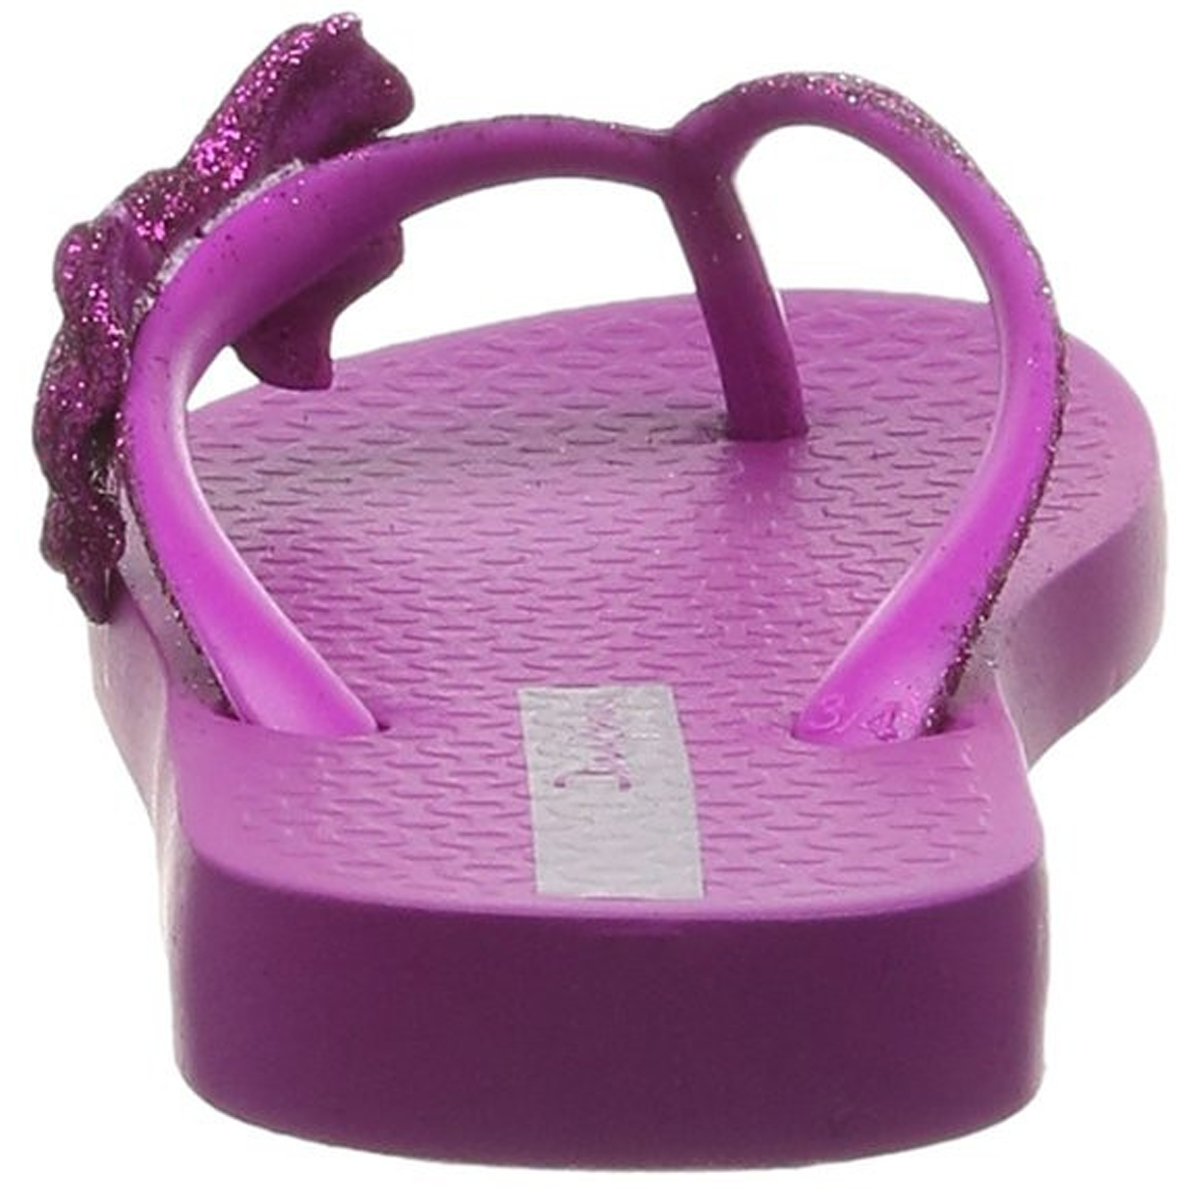 e4d5b891c Flip-Flops Pink Flip Flops - Ipanema Lolita Iii Kids Pink